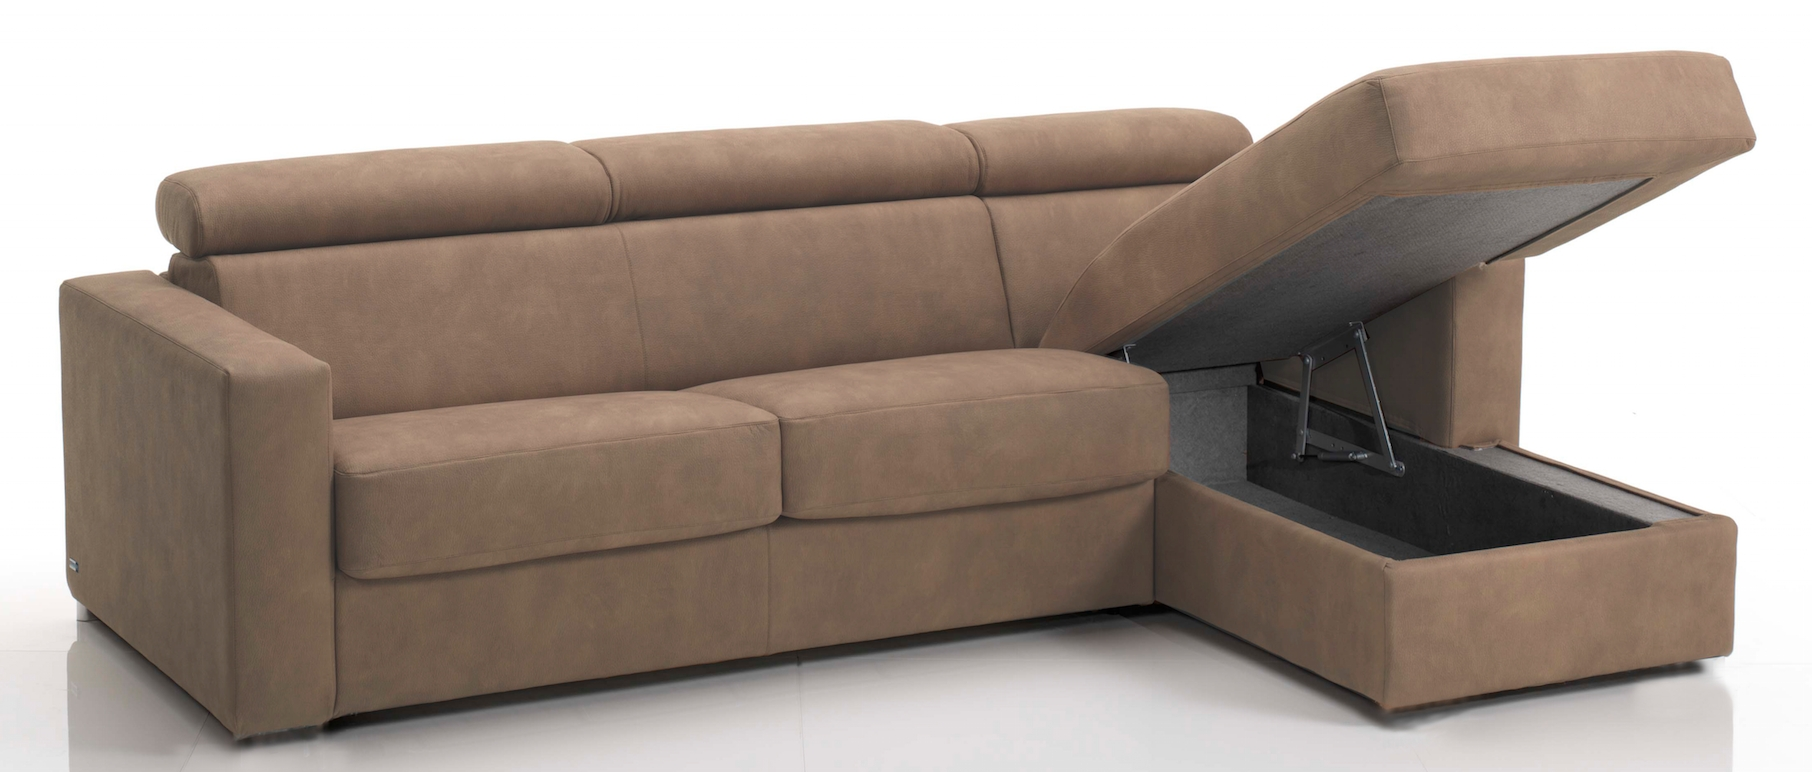 canap d 39 angle convertible avec t ti res rev tement tissu taupe fonc lova mod le 3 places maxi. Black Bedroom Furniture Sets. Home Design Ideas